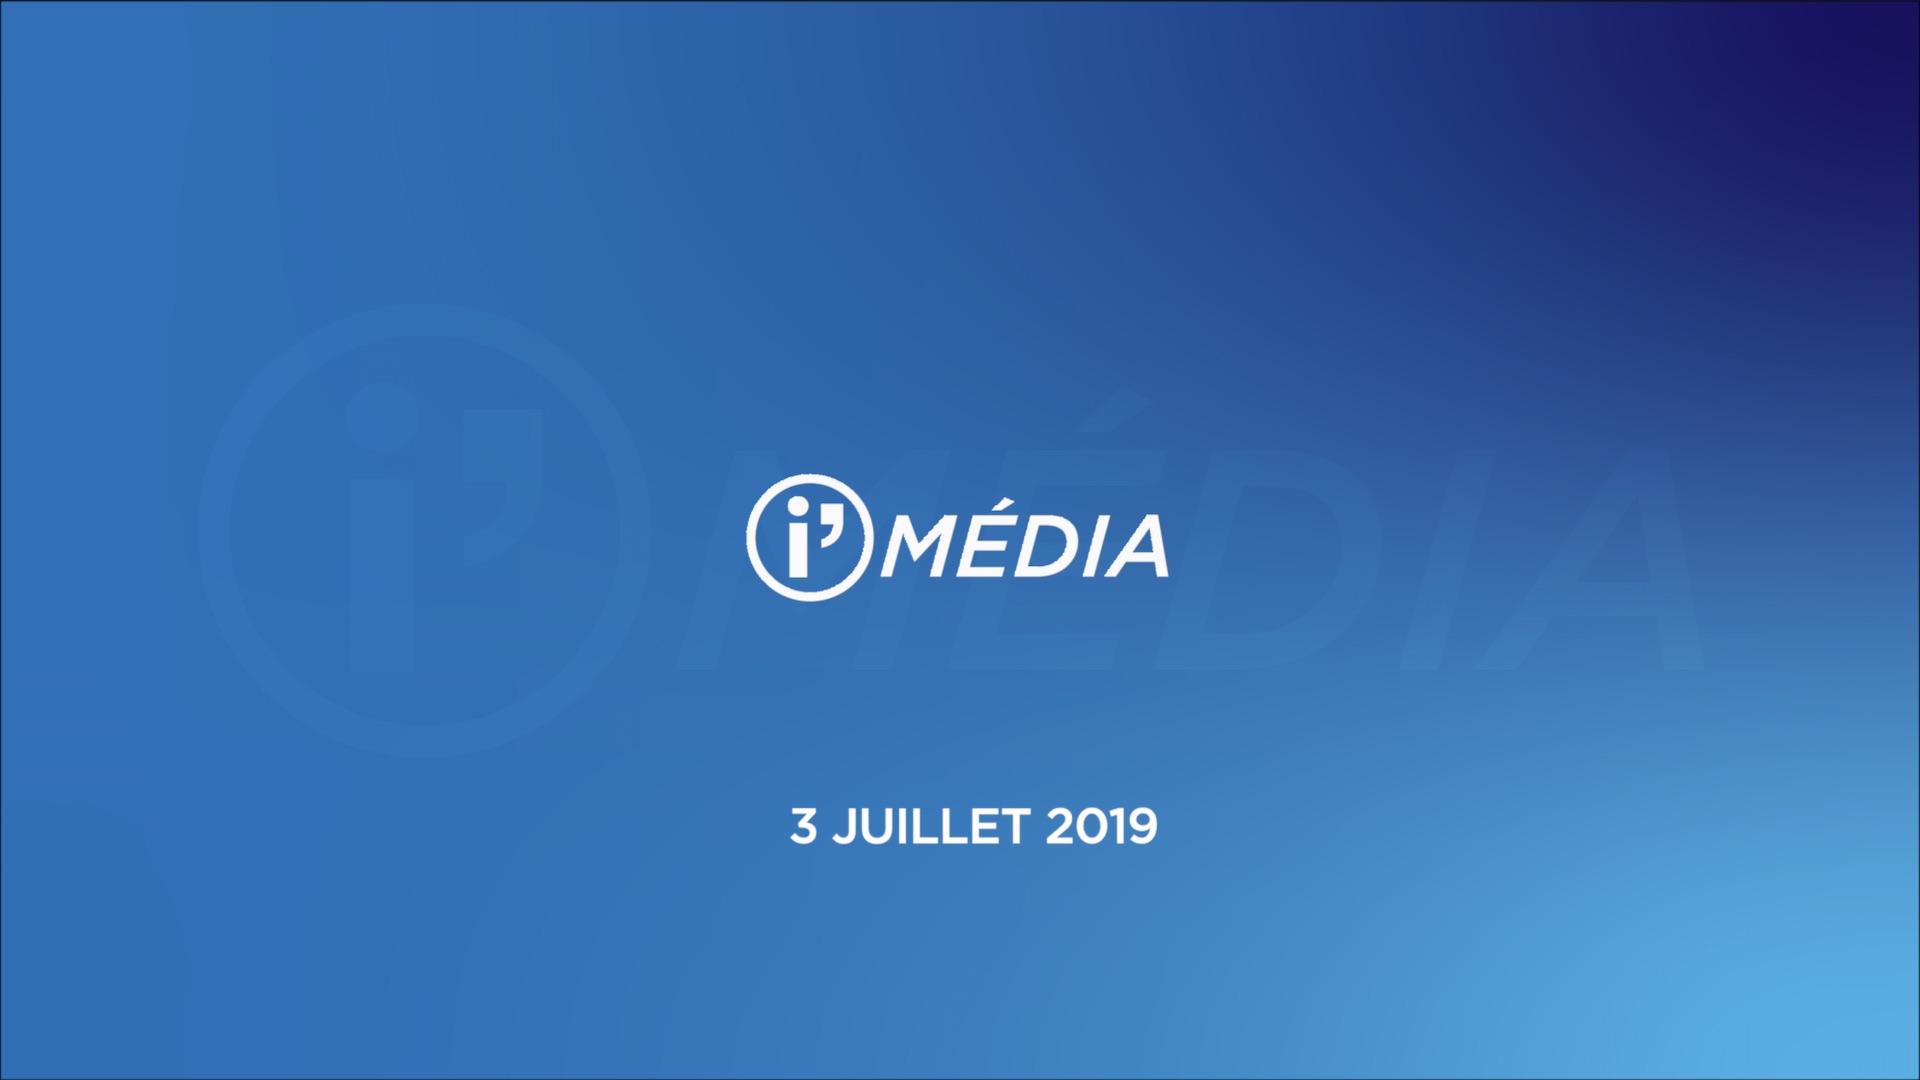 I'média 3 juillet 2019